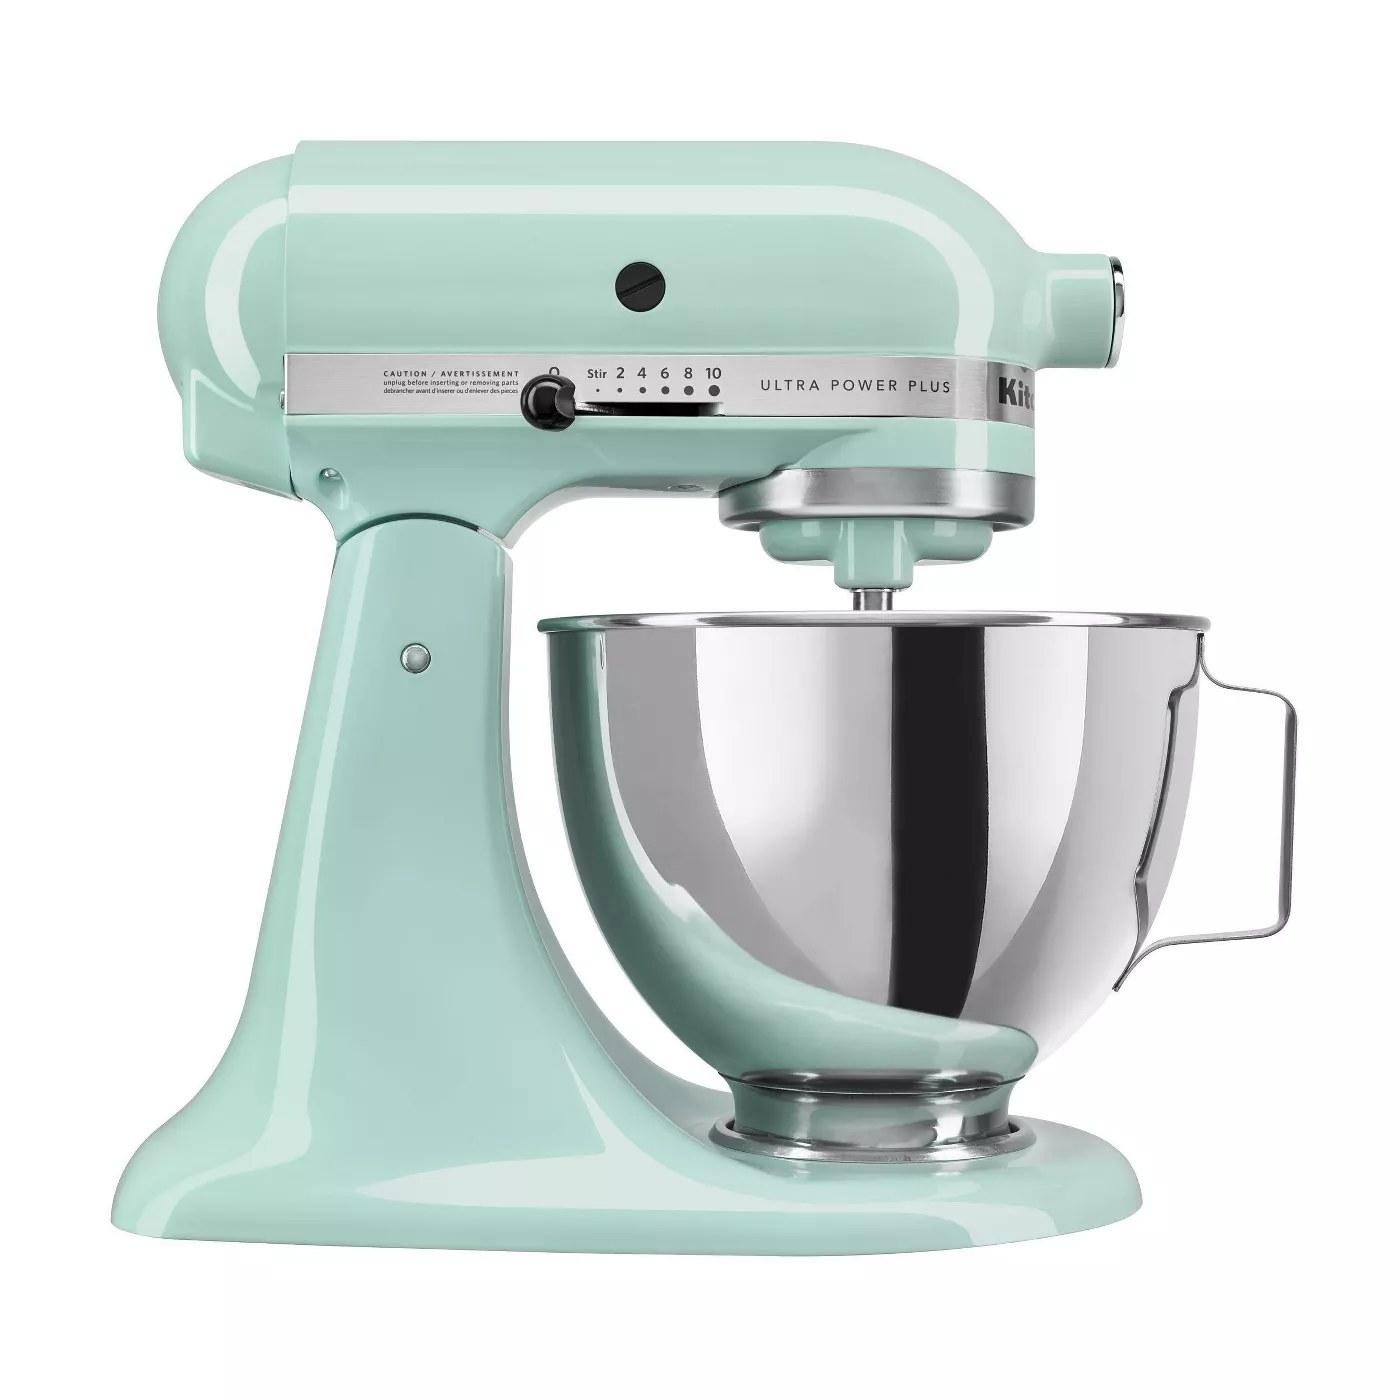 An ice-blue KitchenAid mixer